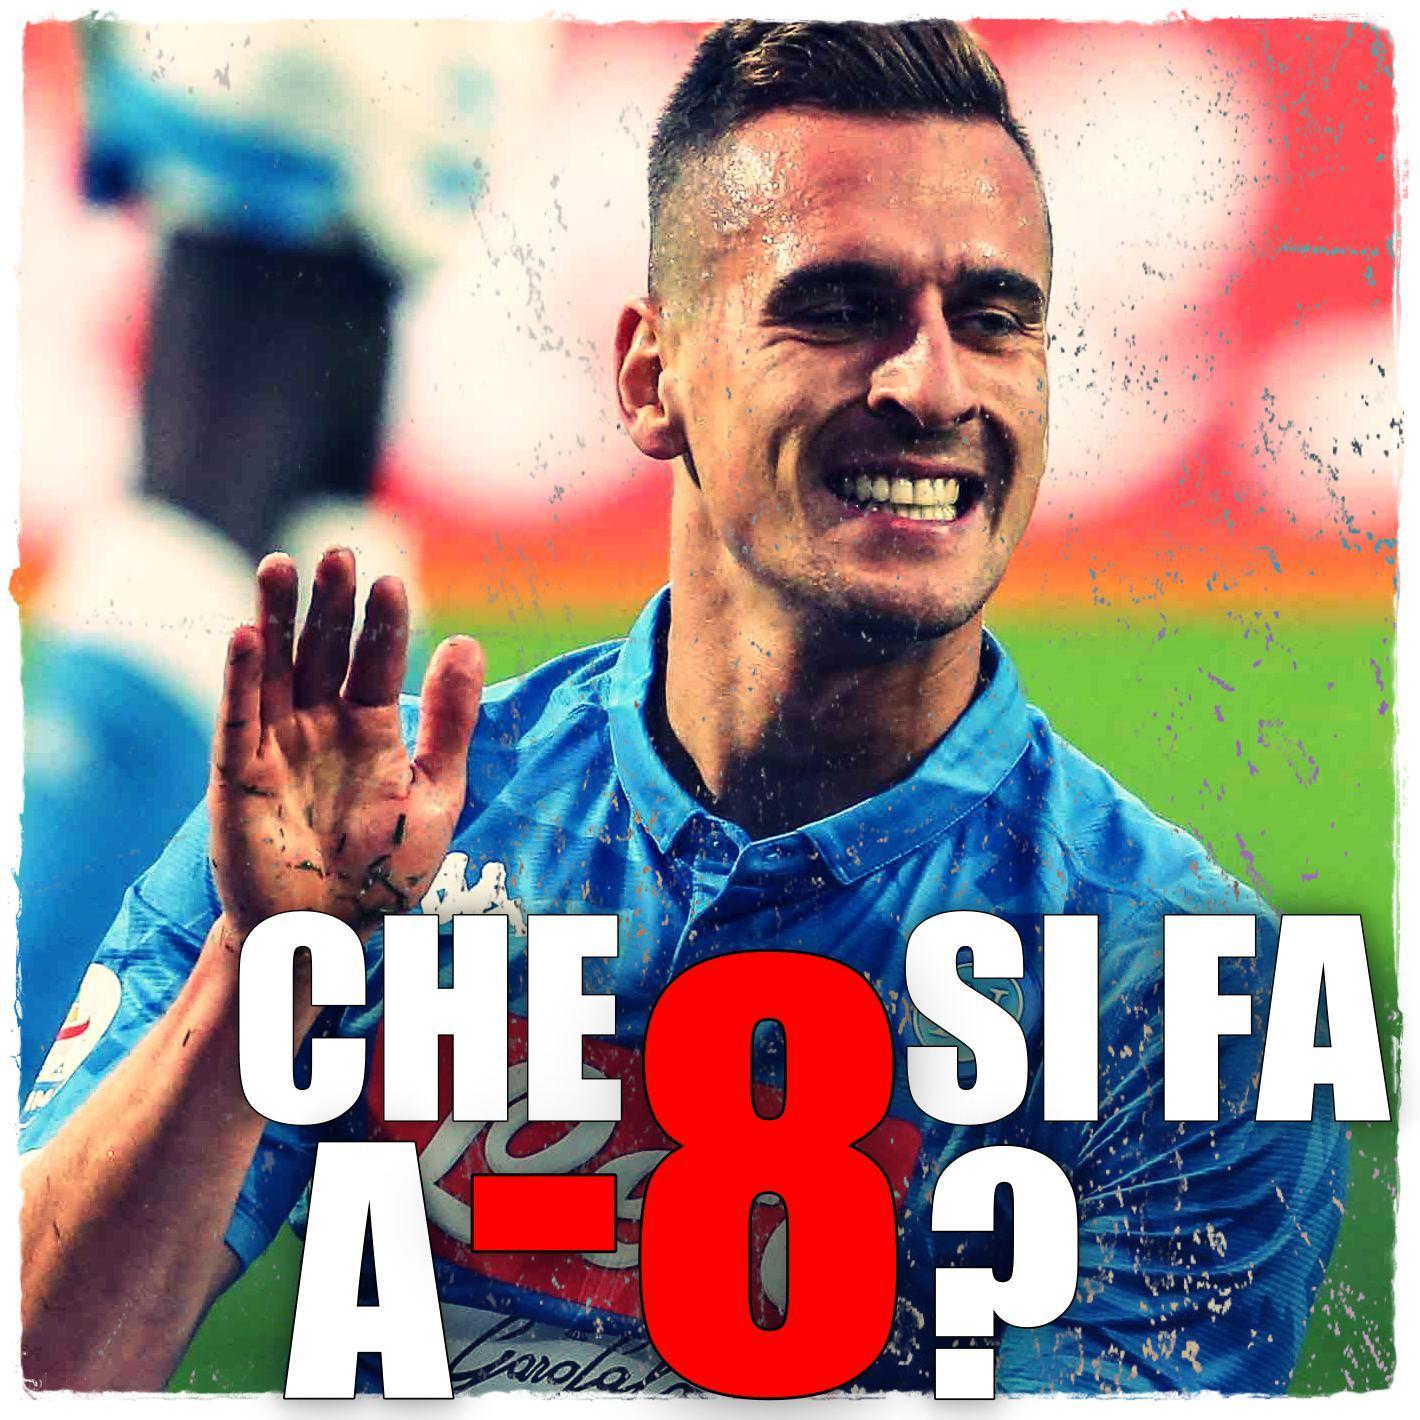 Milik Napoli Chievo 1